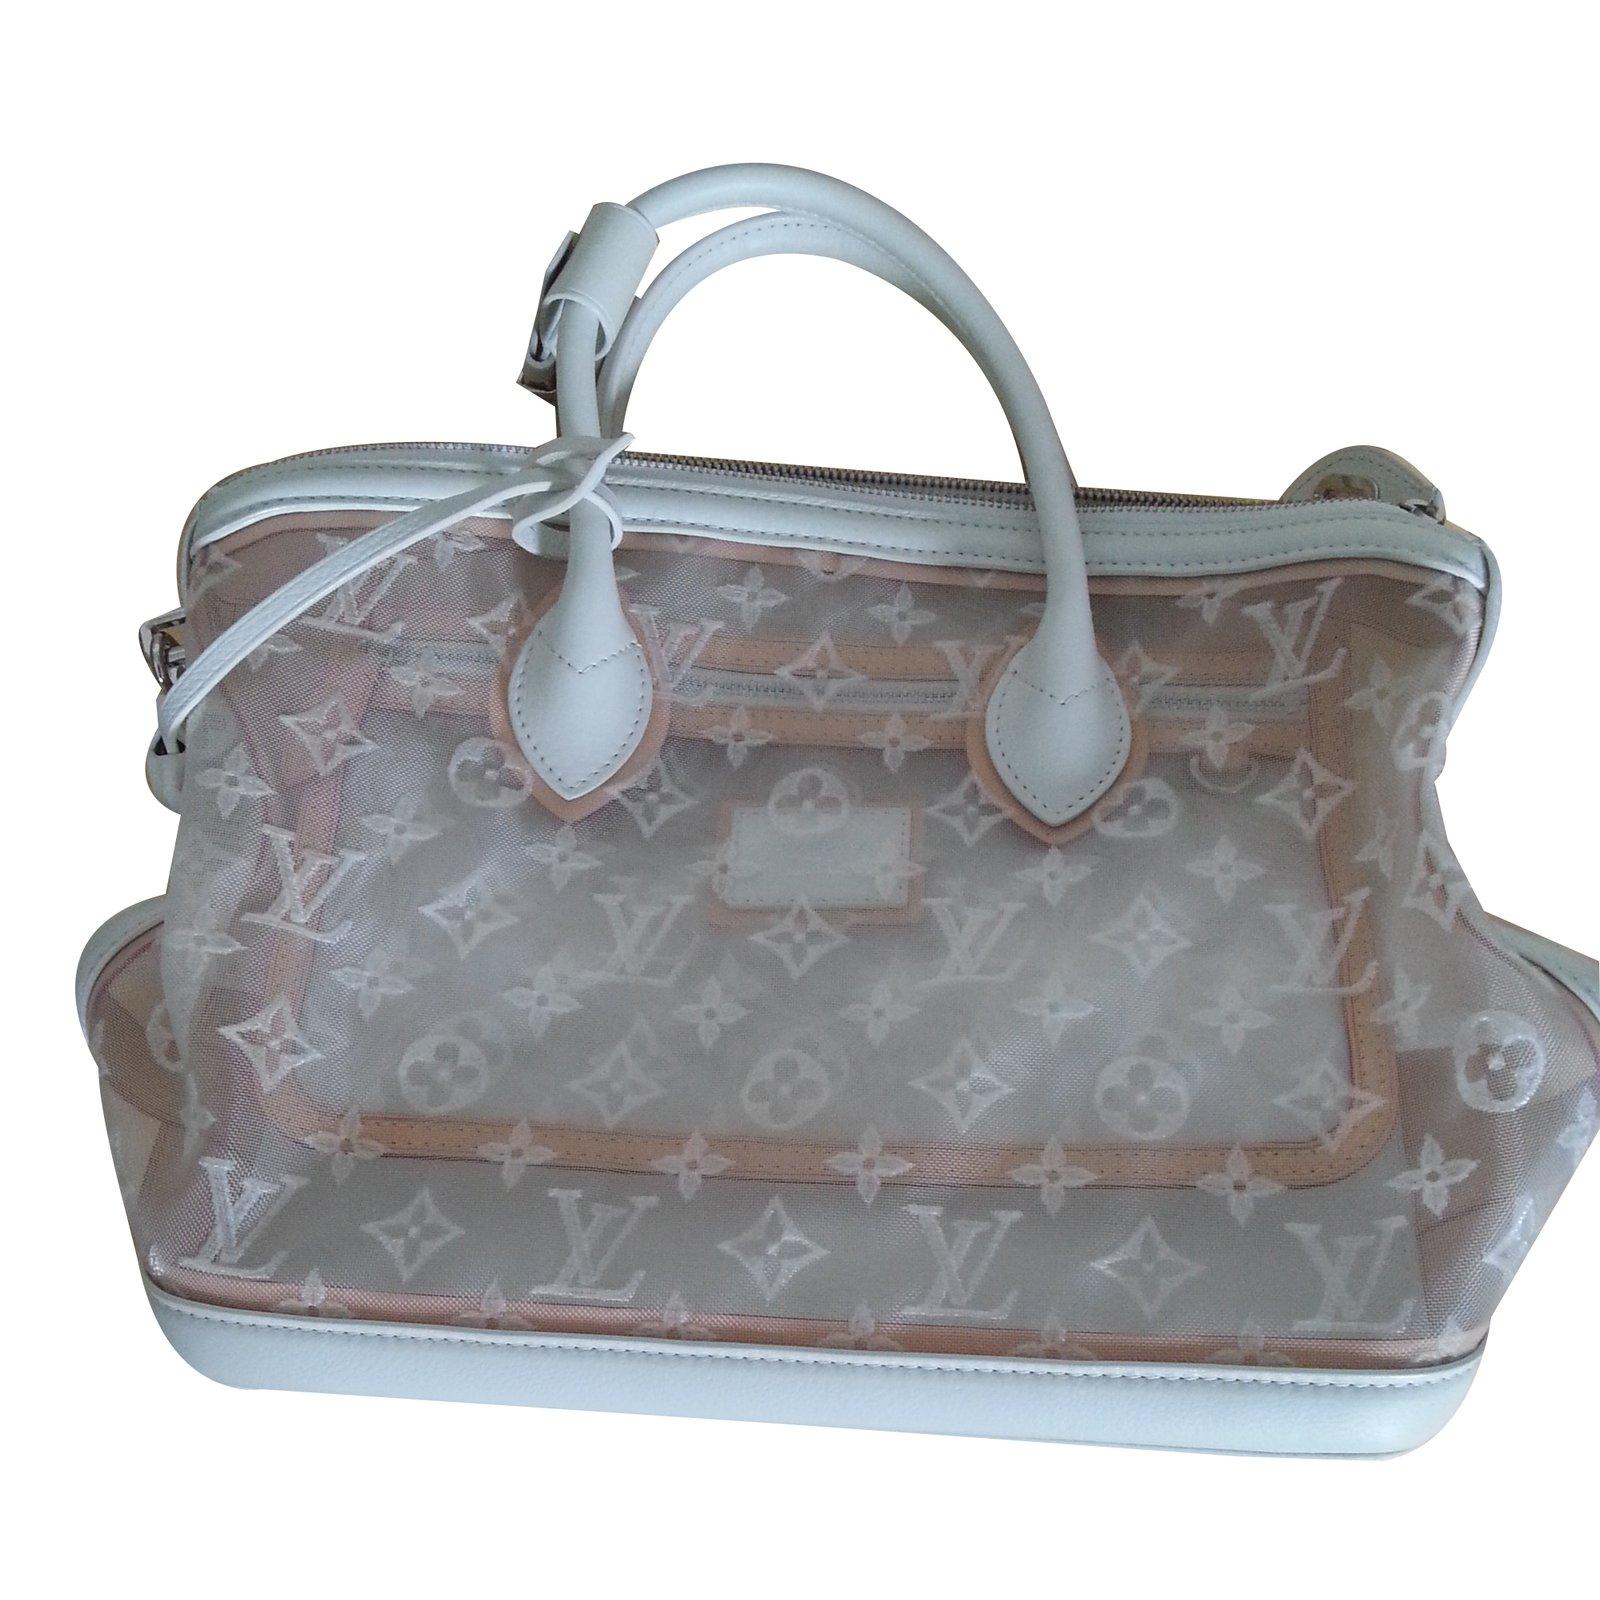 Sac A Main Blanc Louis Vuitton : Sacs ? main louis vuitton lockit en monogram transparent